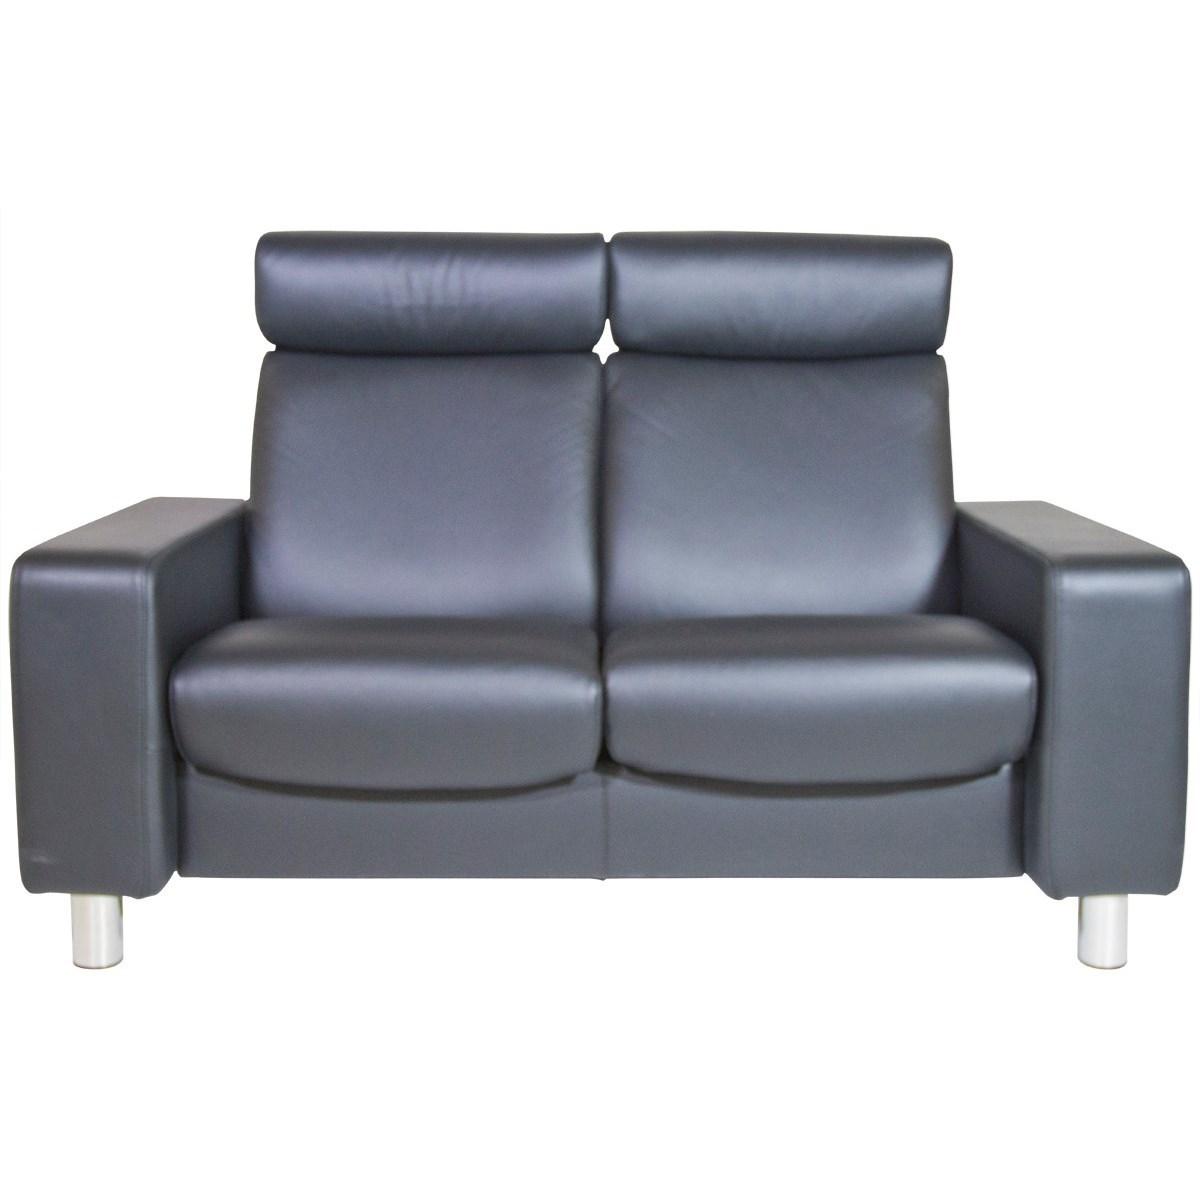 Stressless By Ekornes Stressless Pause Loveseat Homeworld Furniture Love Seats